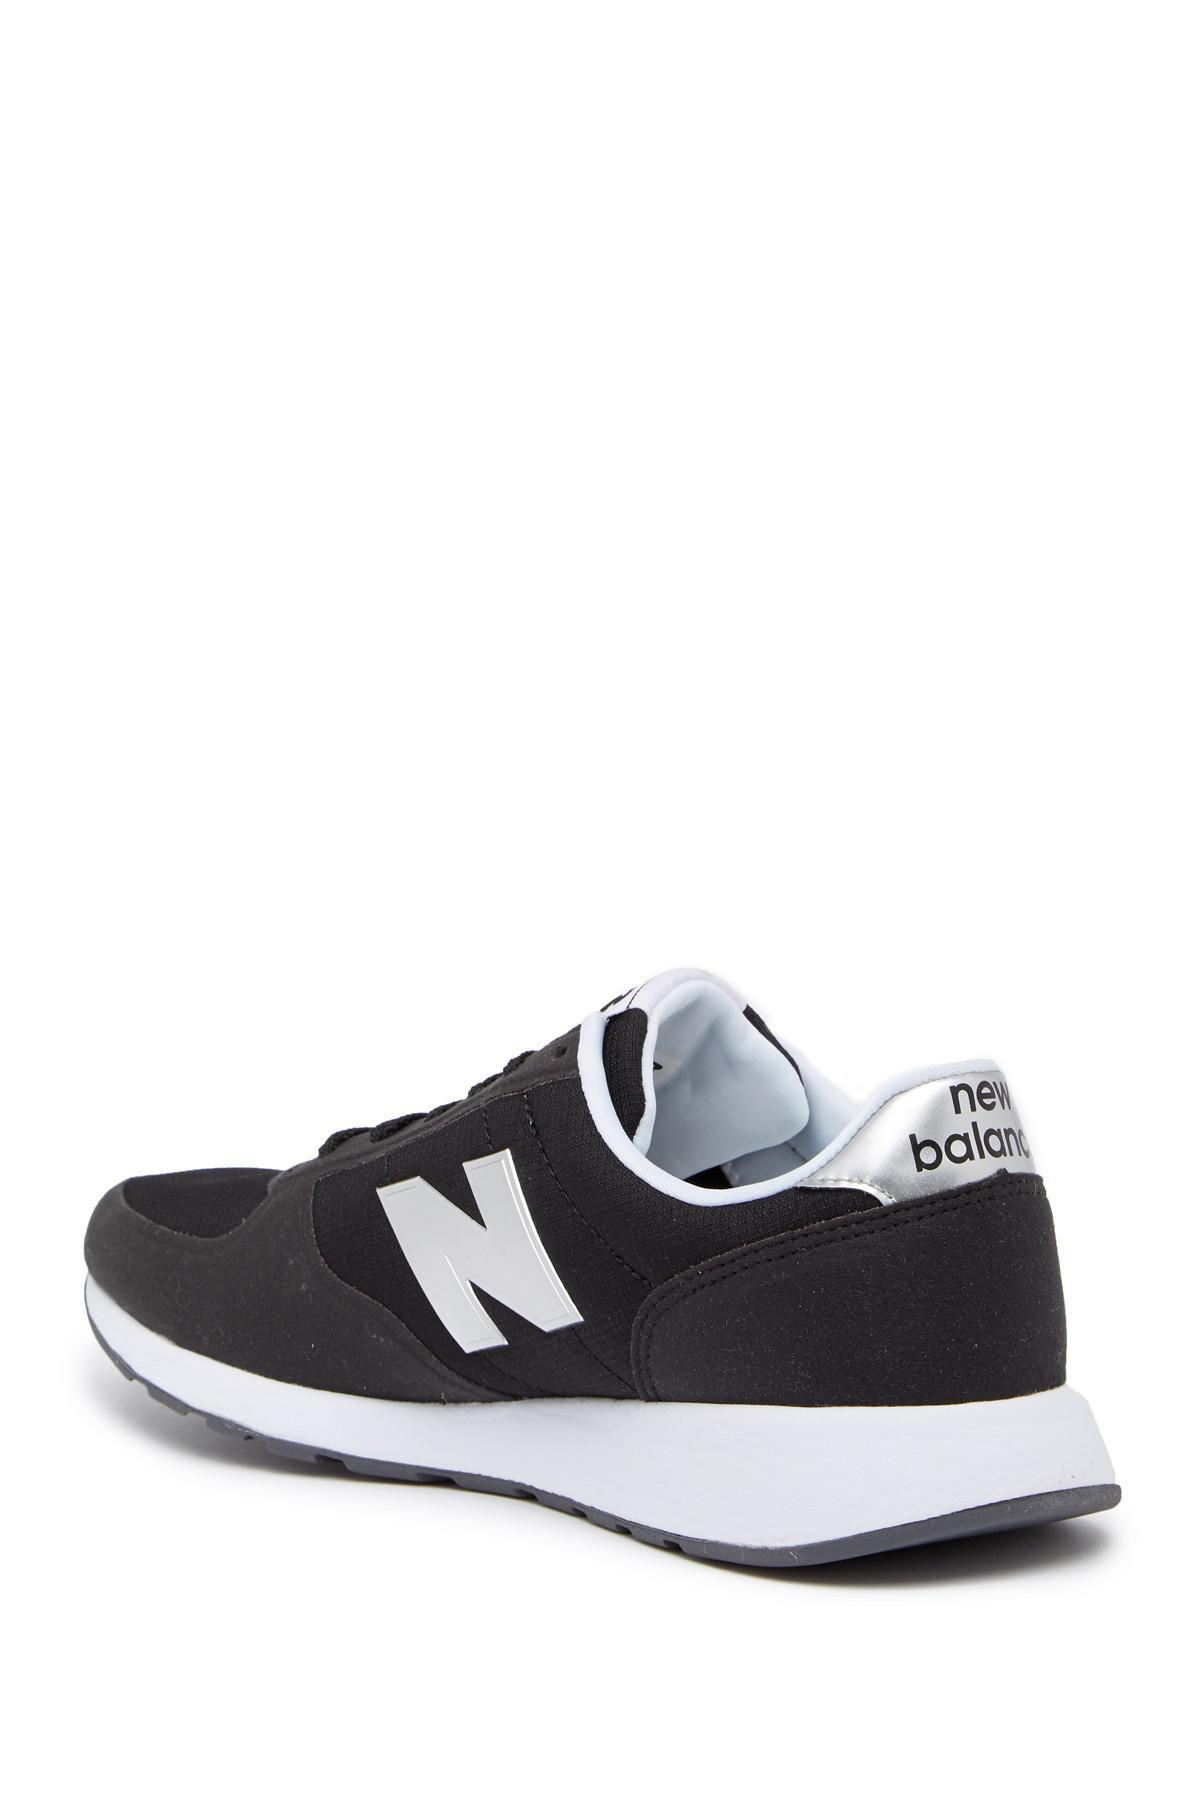 New Balance 220 V1 Lifestyle Sneaker e9l1l3s